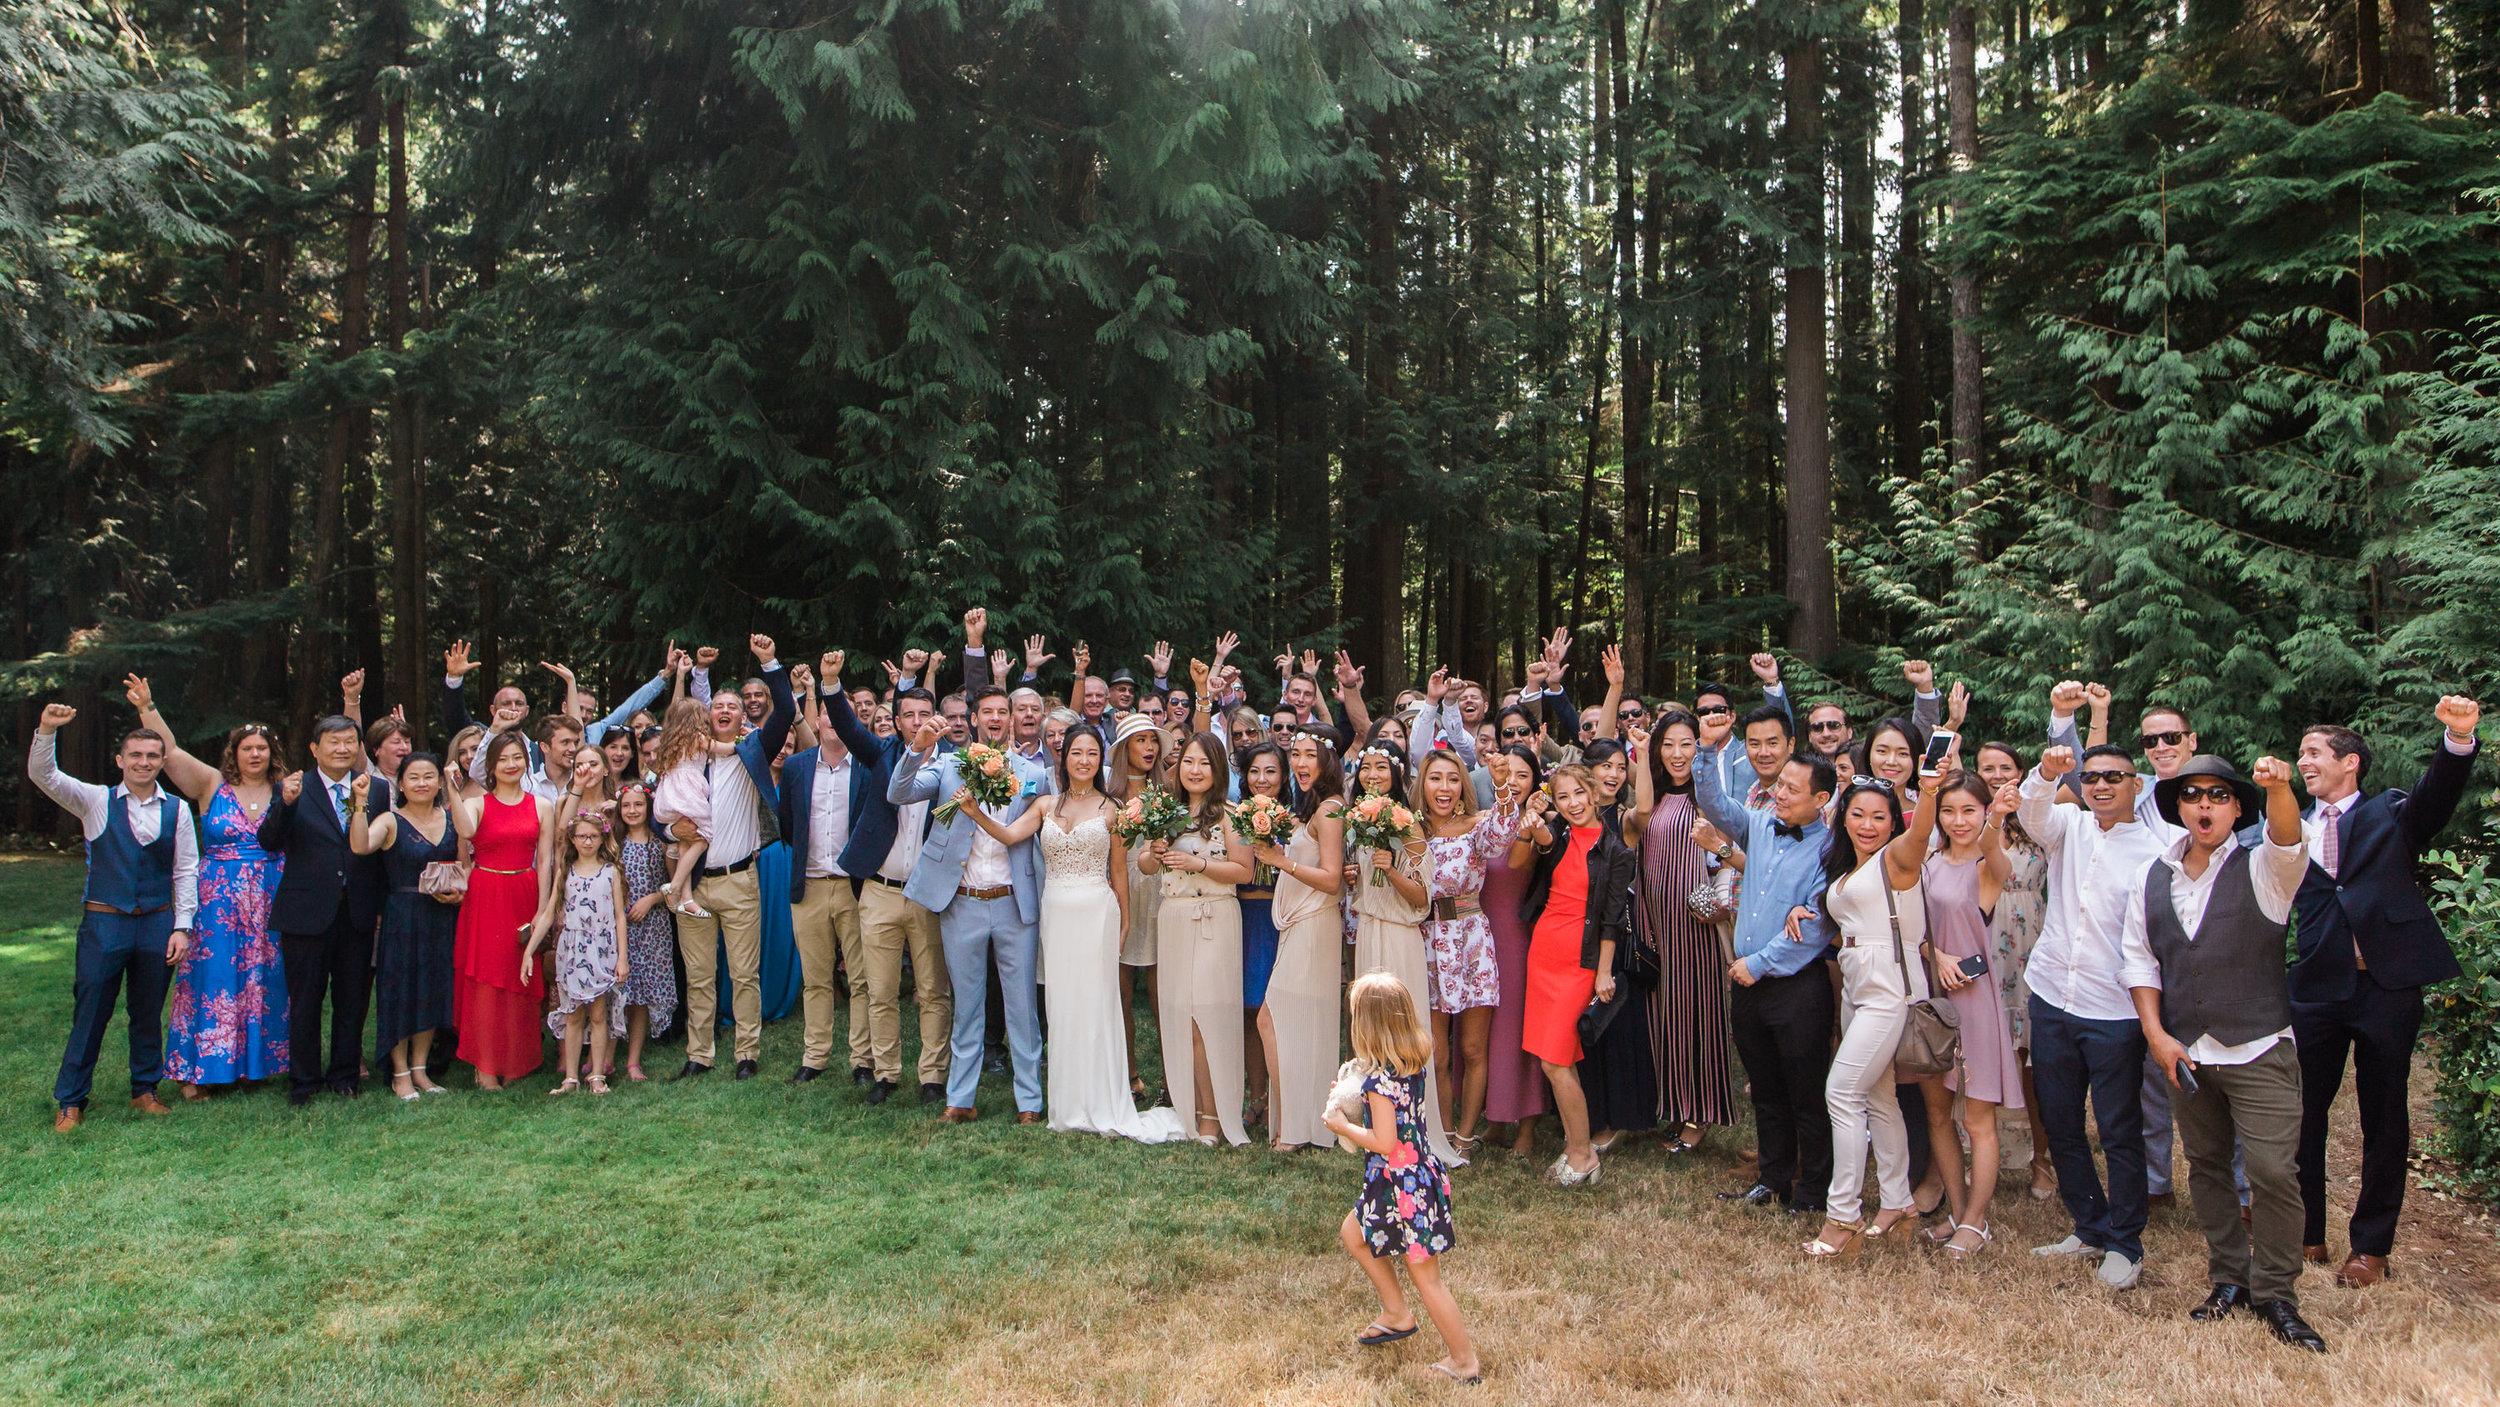 Linwood House Wedding Photos - Roberts Creek Wedding Photos - Vancouver Wedding Photographer & Videographer - Sunshine Coast Wedding Photos - Sunshine Coast Wedding Photographer - Jennifer Picard Photography - IMG_6652.jpg